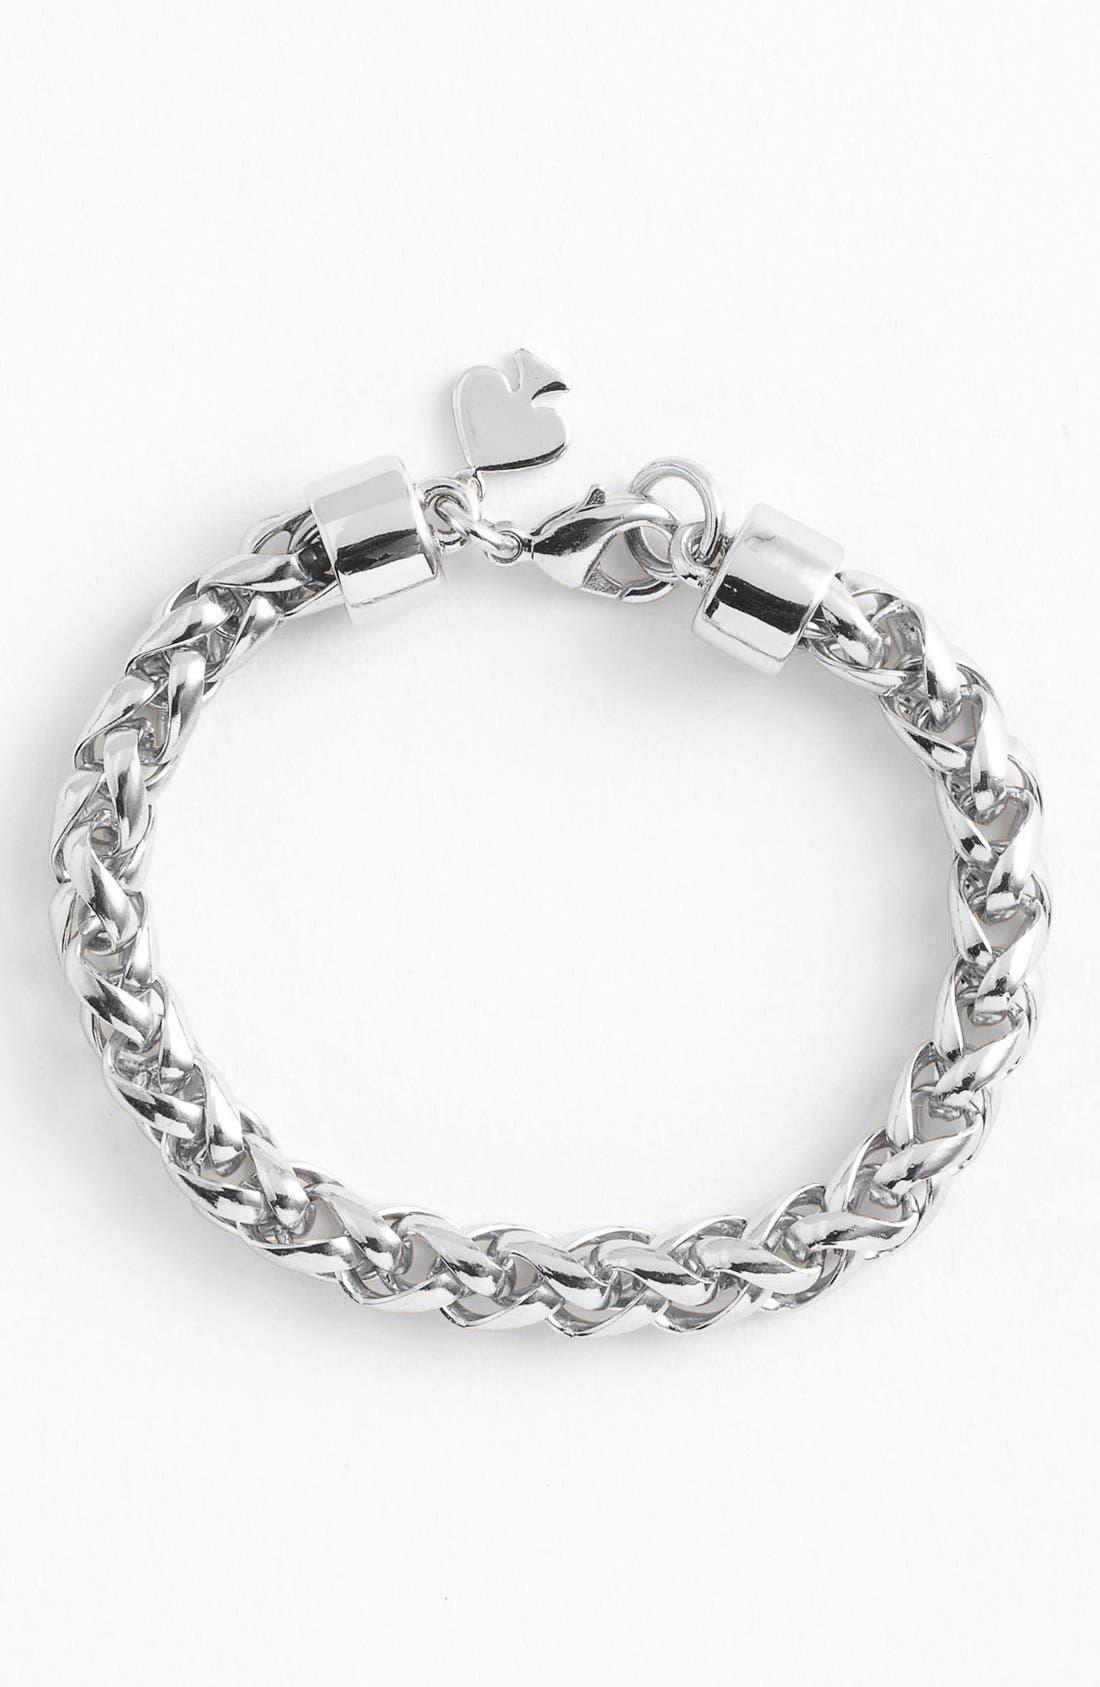 Main Image - kate spade new york 'learn the ropes' link bracelet